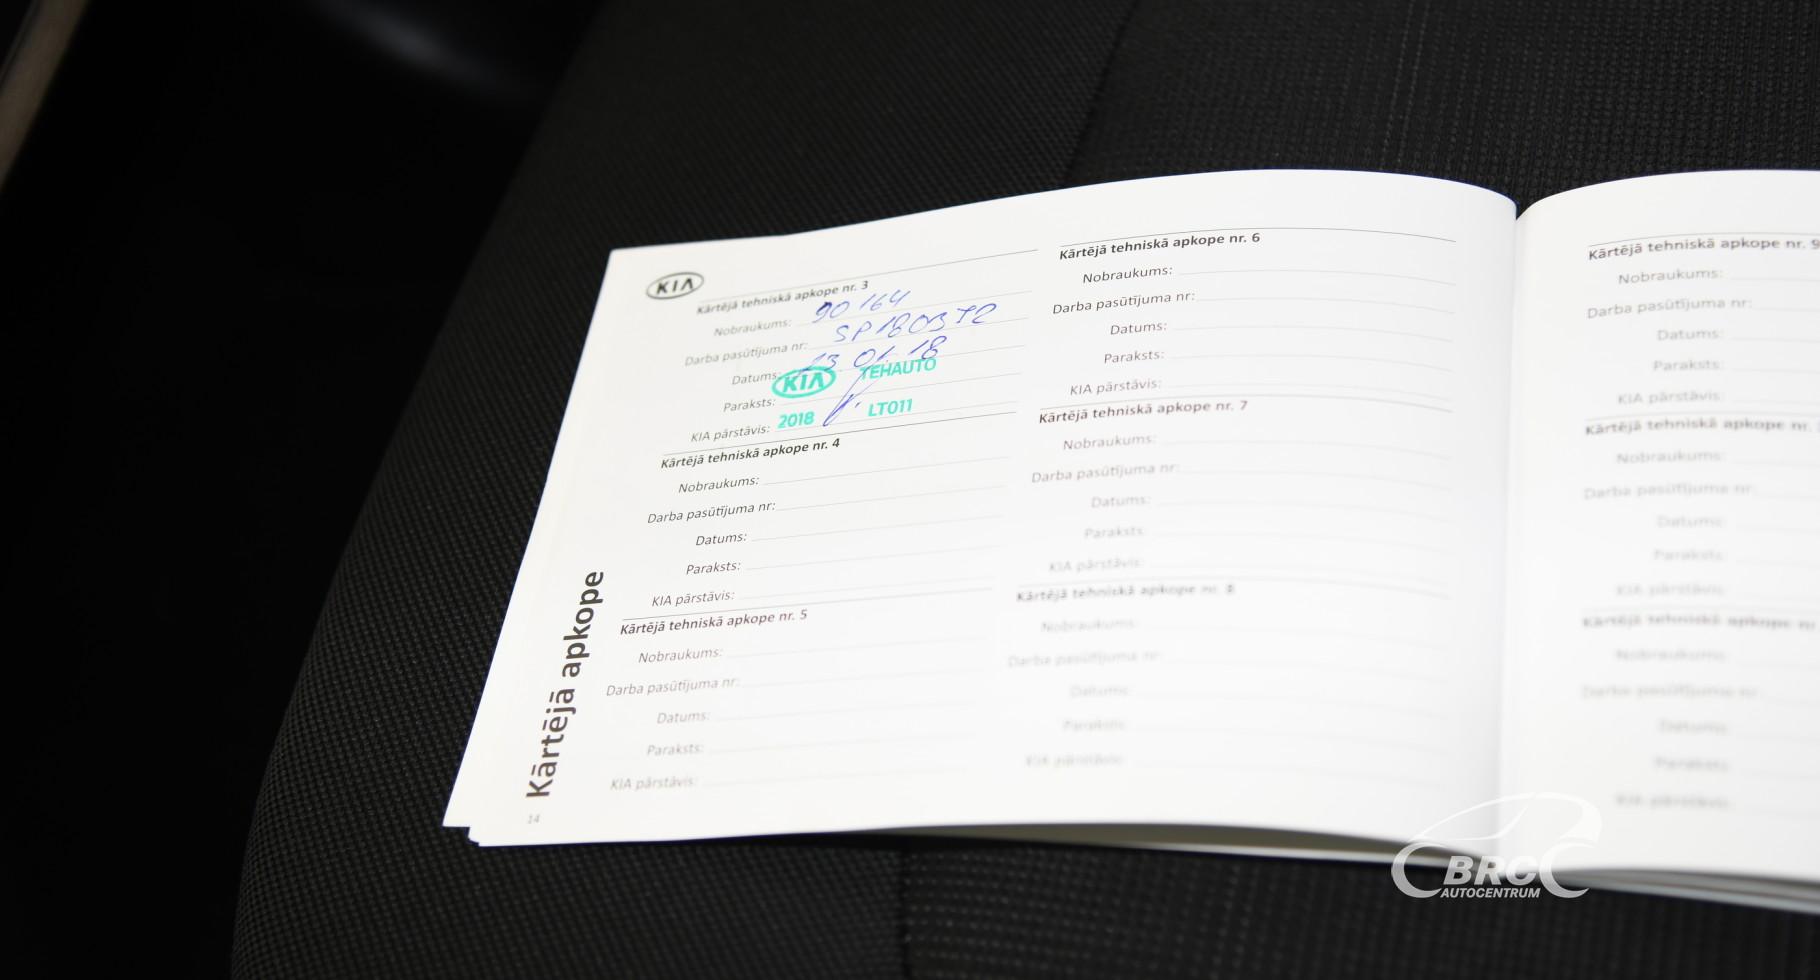 Kia Sportage 2.0 CRDI LX AWD